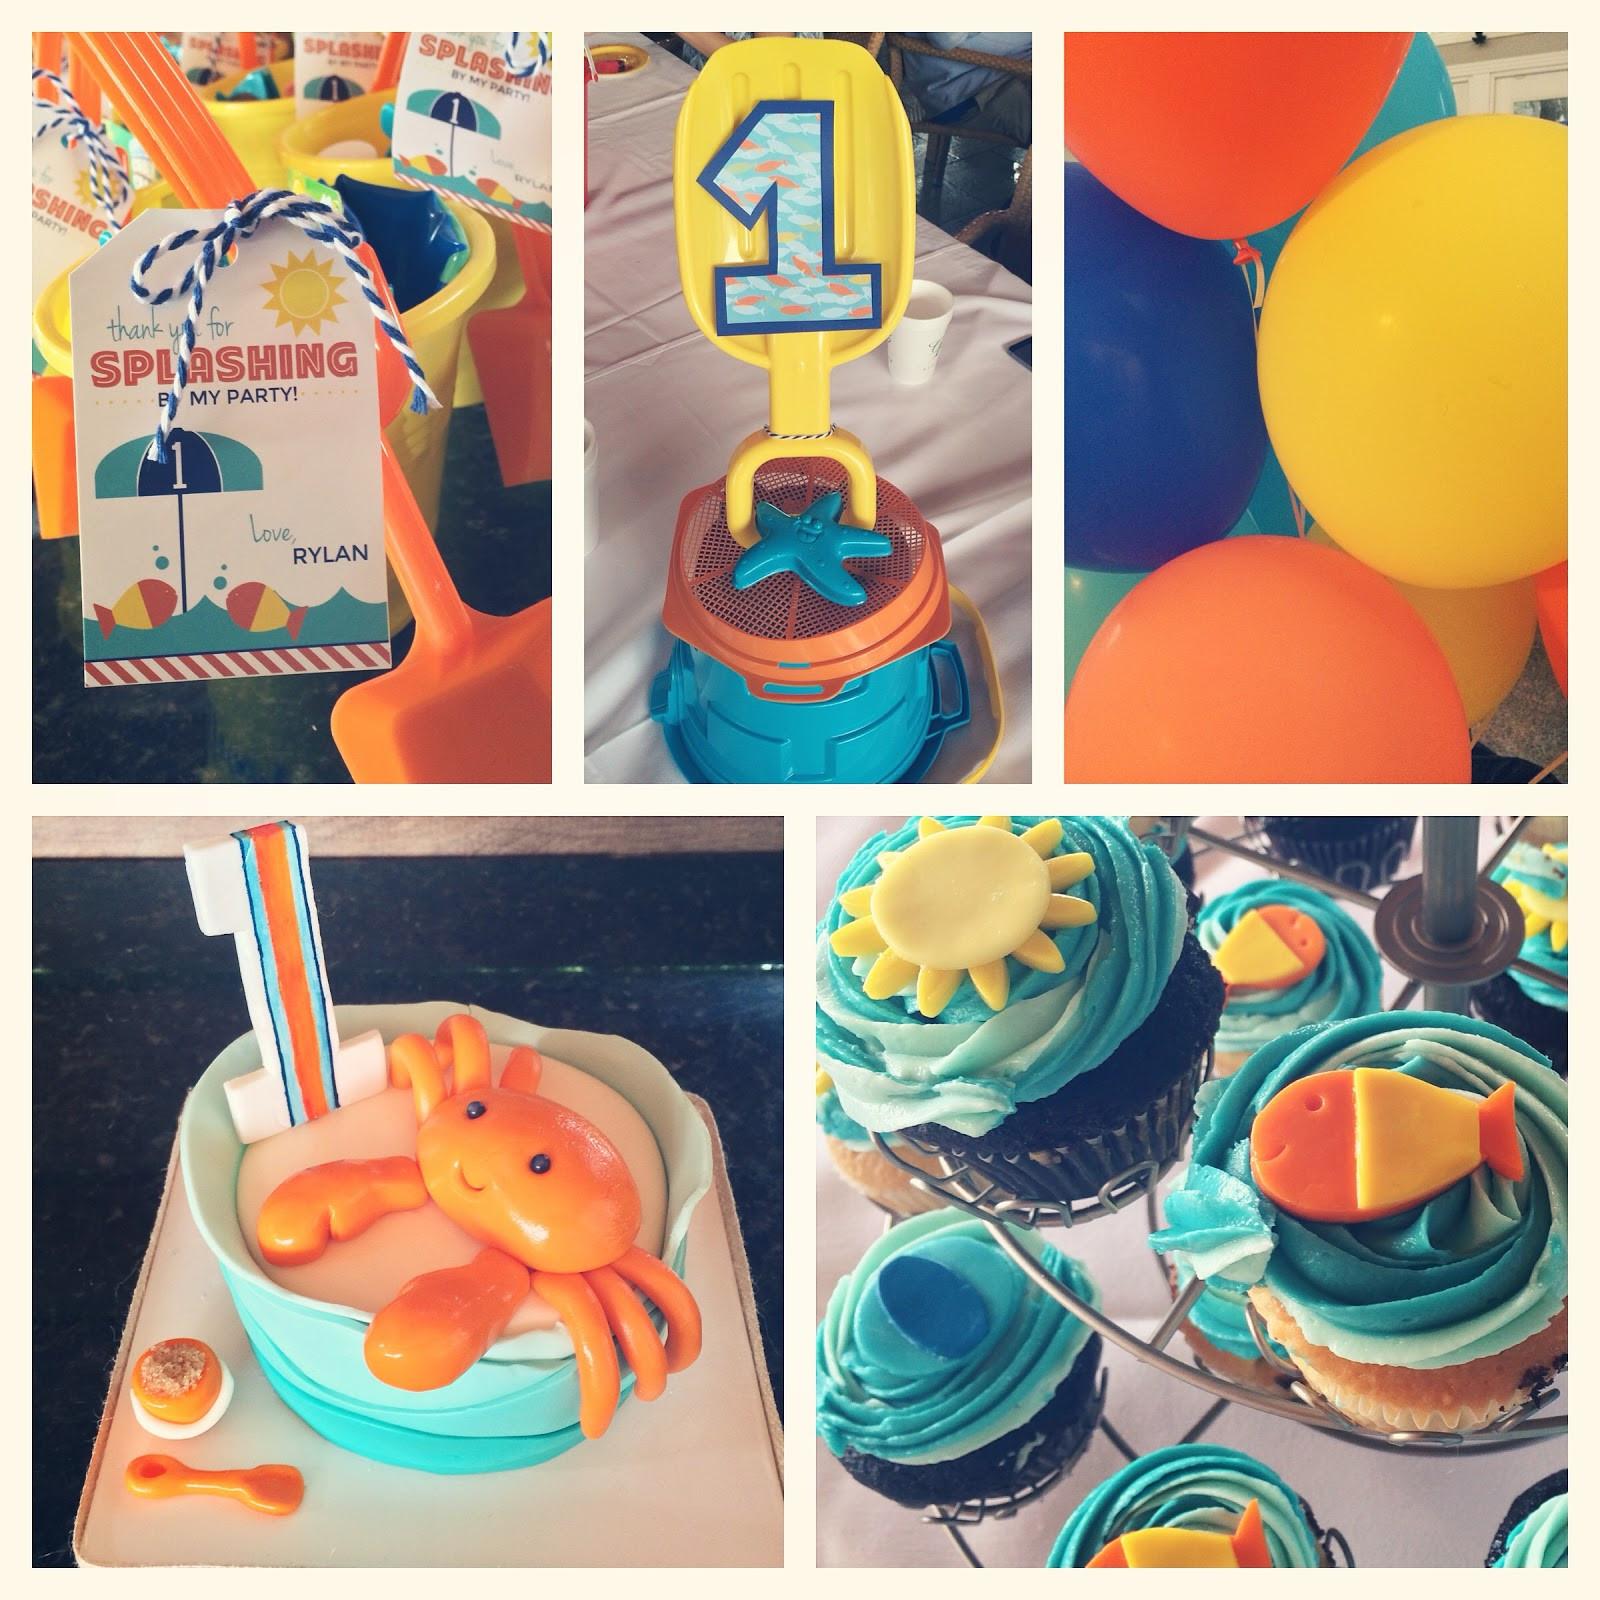 First Birthday Pool Party Ideas  Team Shep Blog Rylan s First Birthday Pool Party